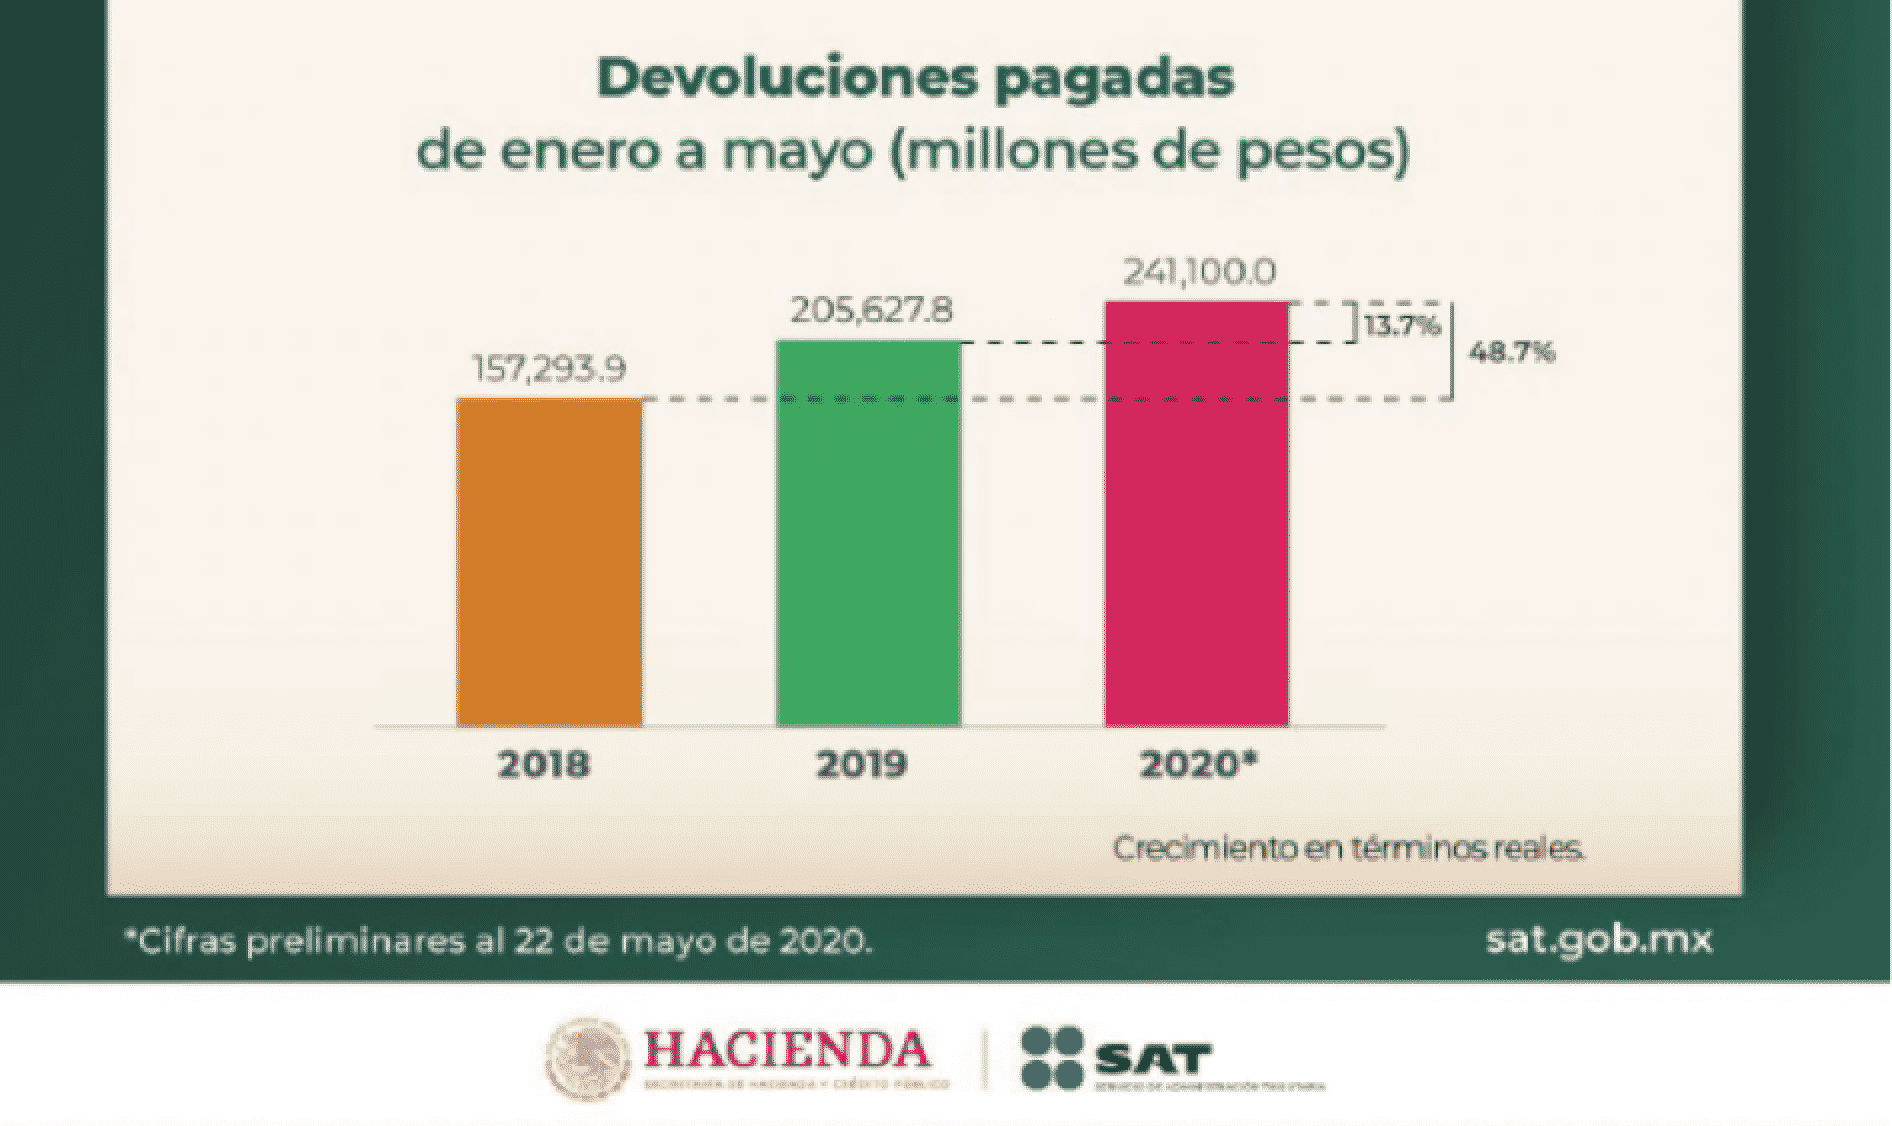 Devoluciones Pagadas